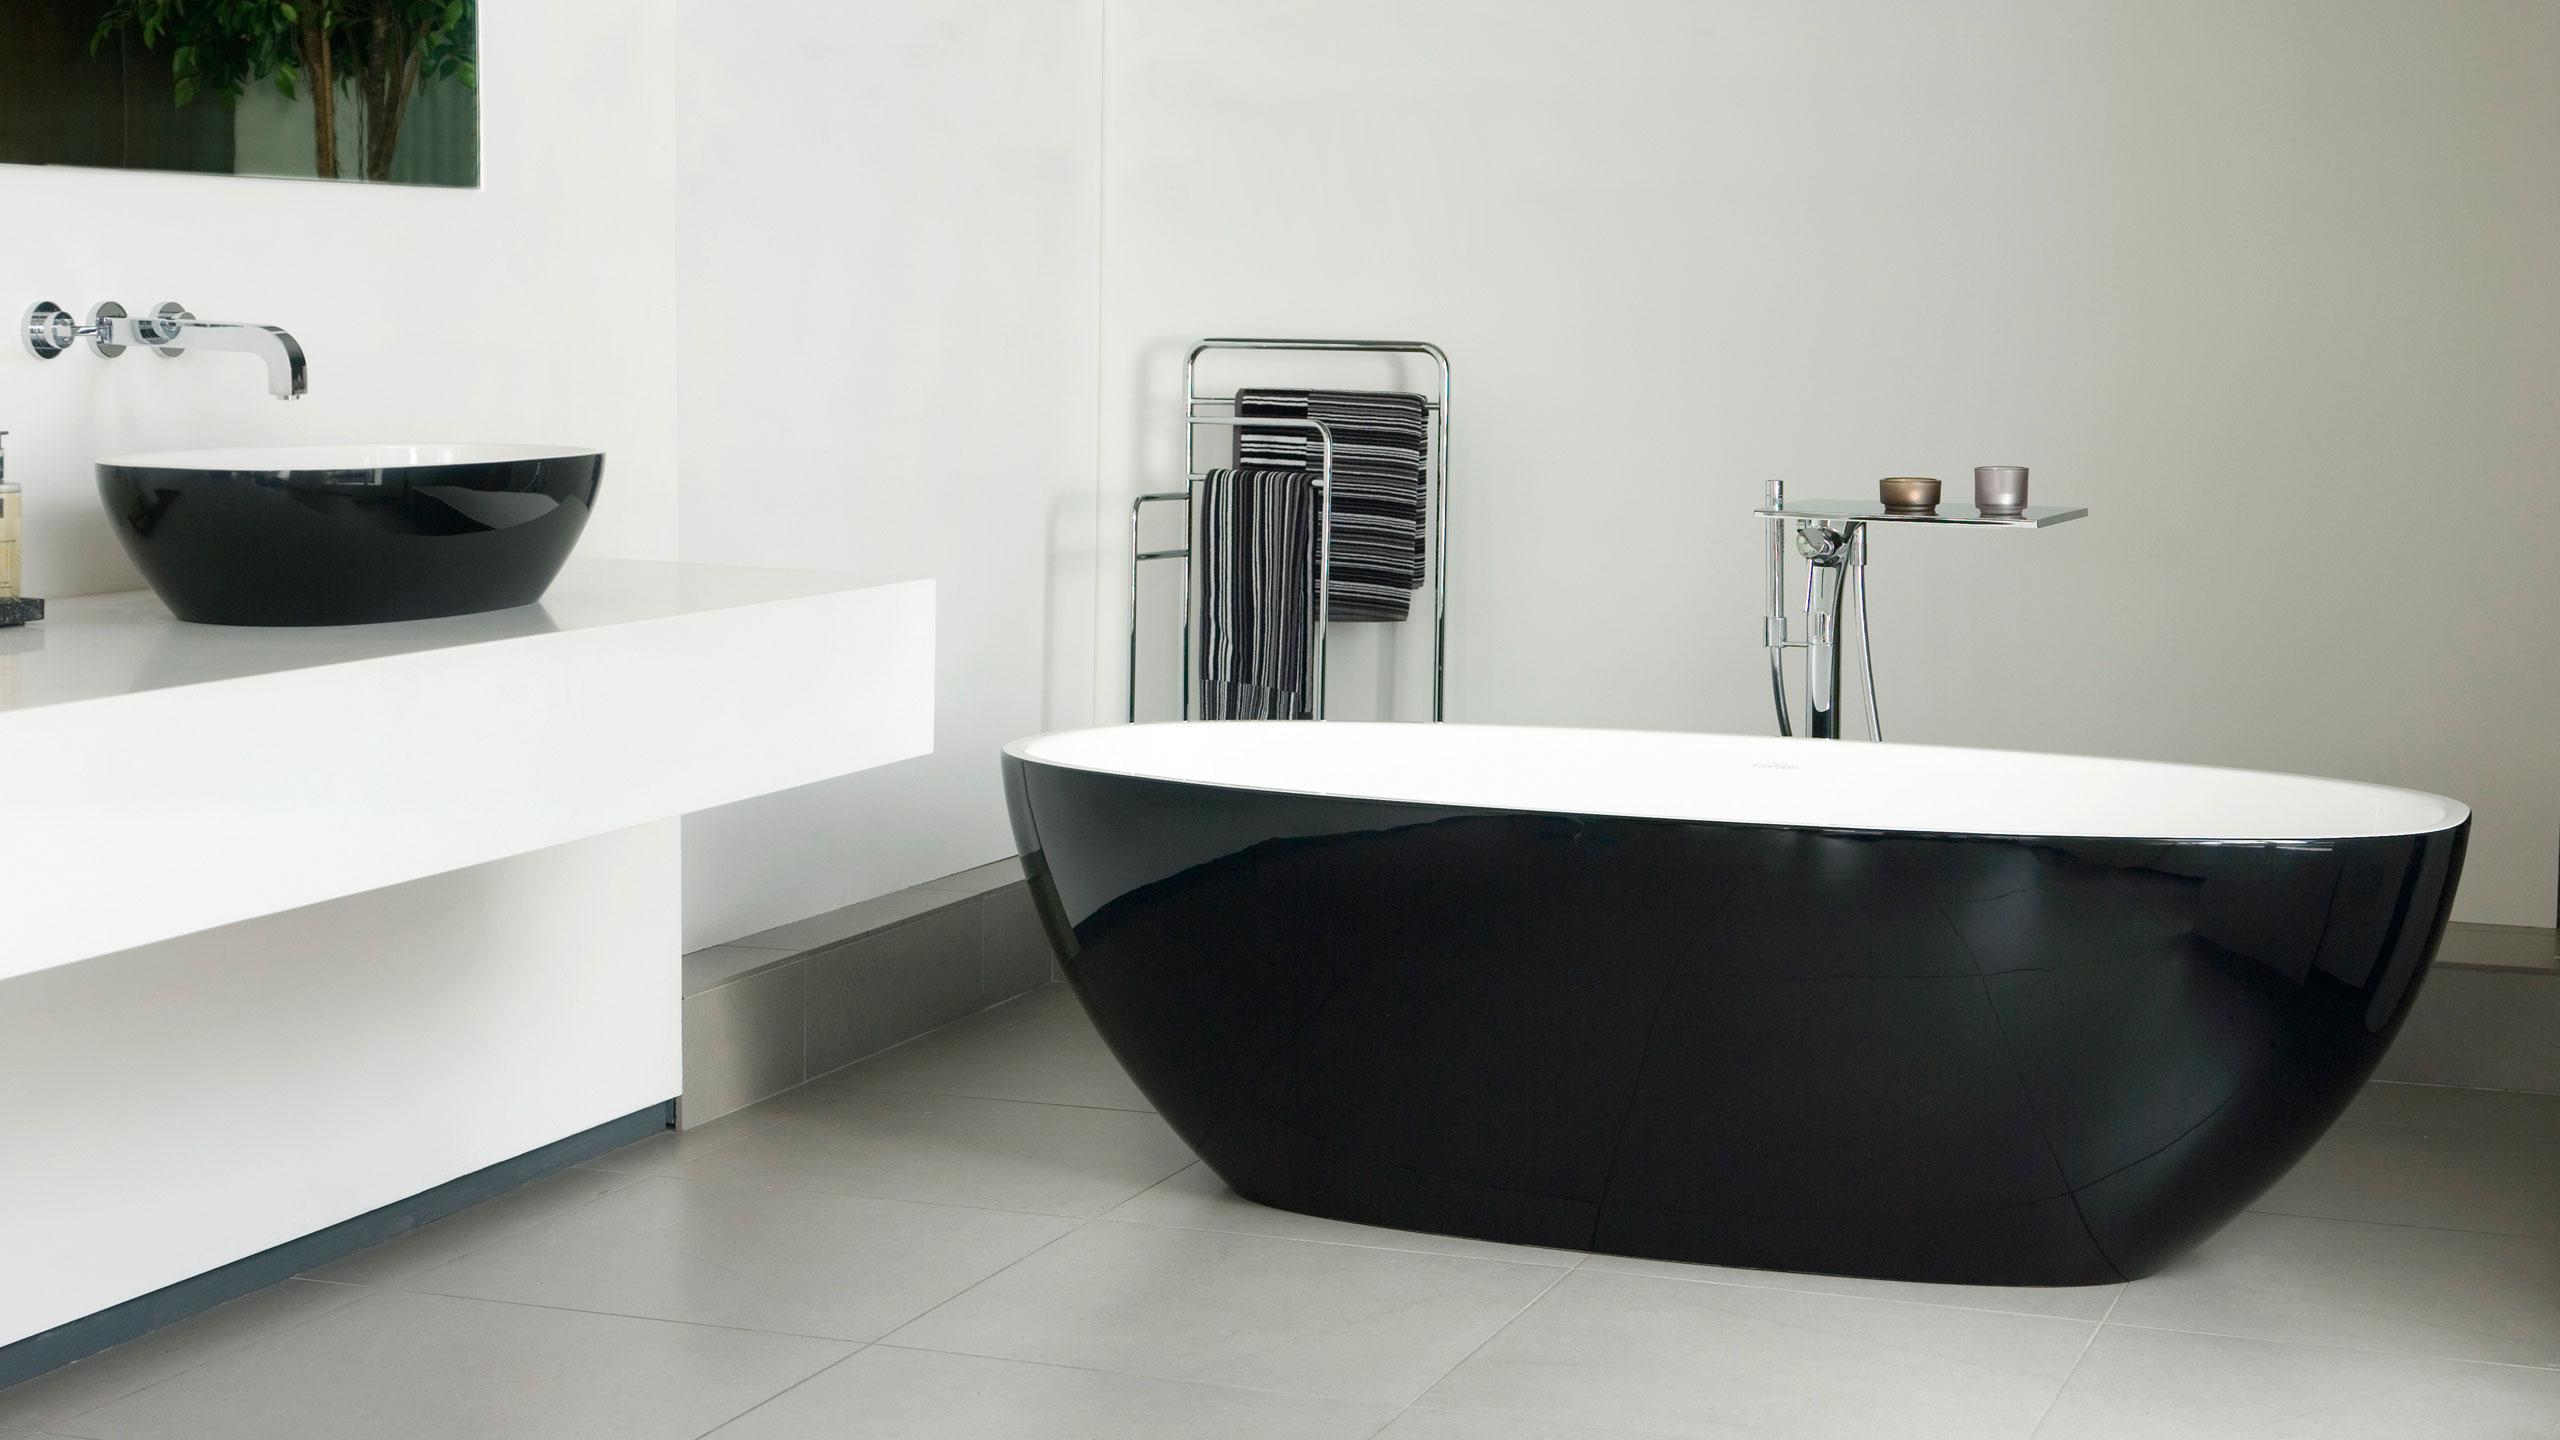 https://designerpages.s3.amazonaws.com/assets/61000551/Barcelona_Gallery_3black_EU.jpg